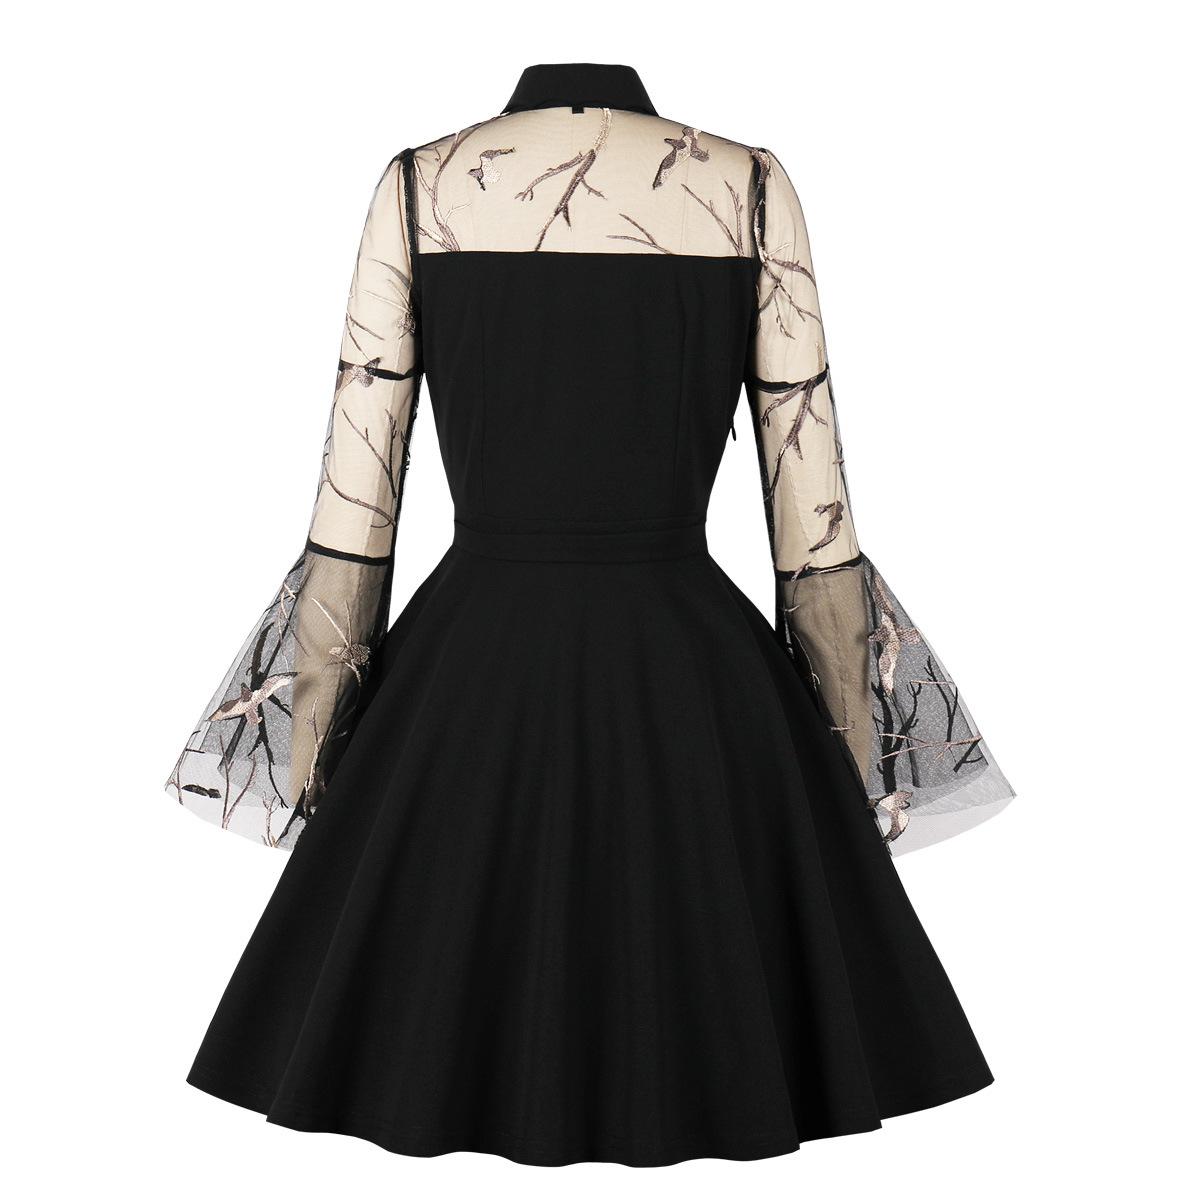 women's mesh embroidery trumpet sleeve stitching dress nihaostyles clothing wholesale NSMXN78855